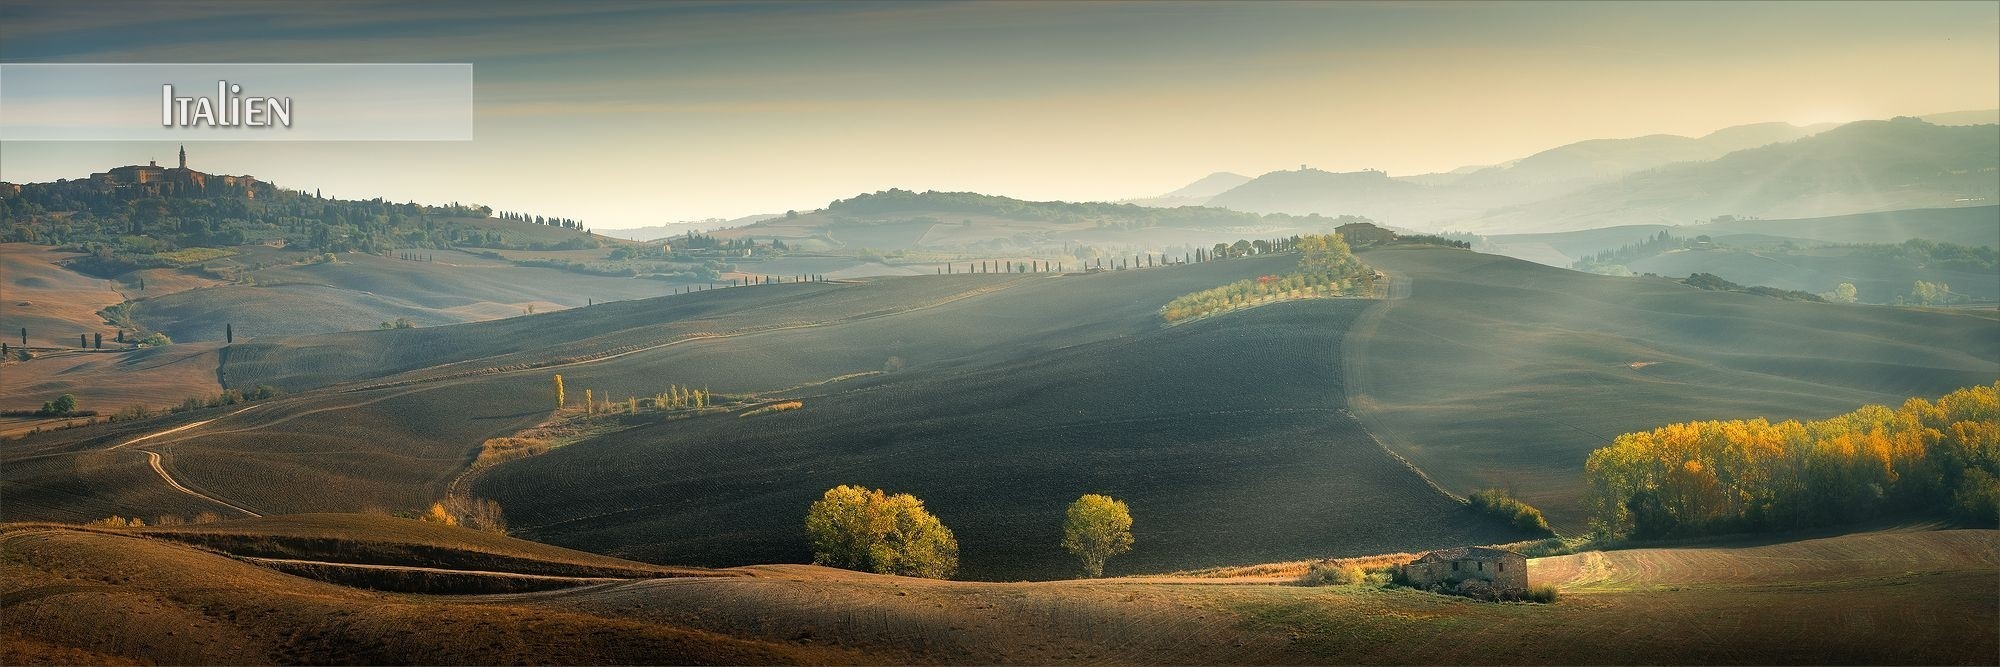 Bilder aus Italien als Wandbild oder Küchenrückwand